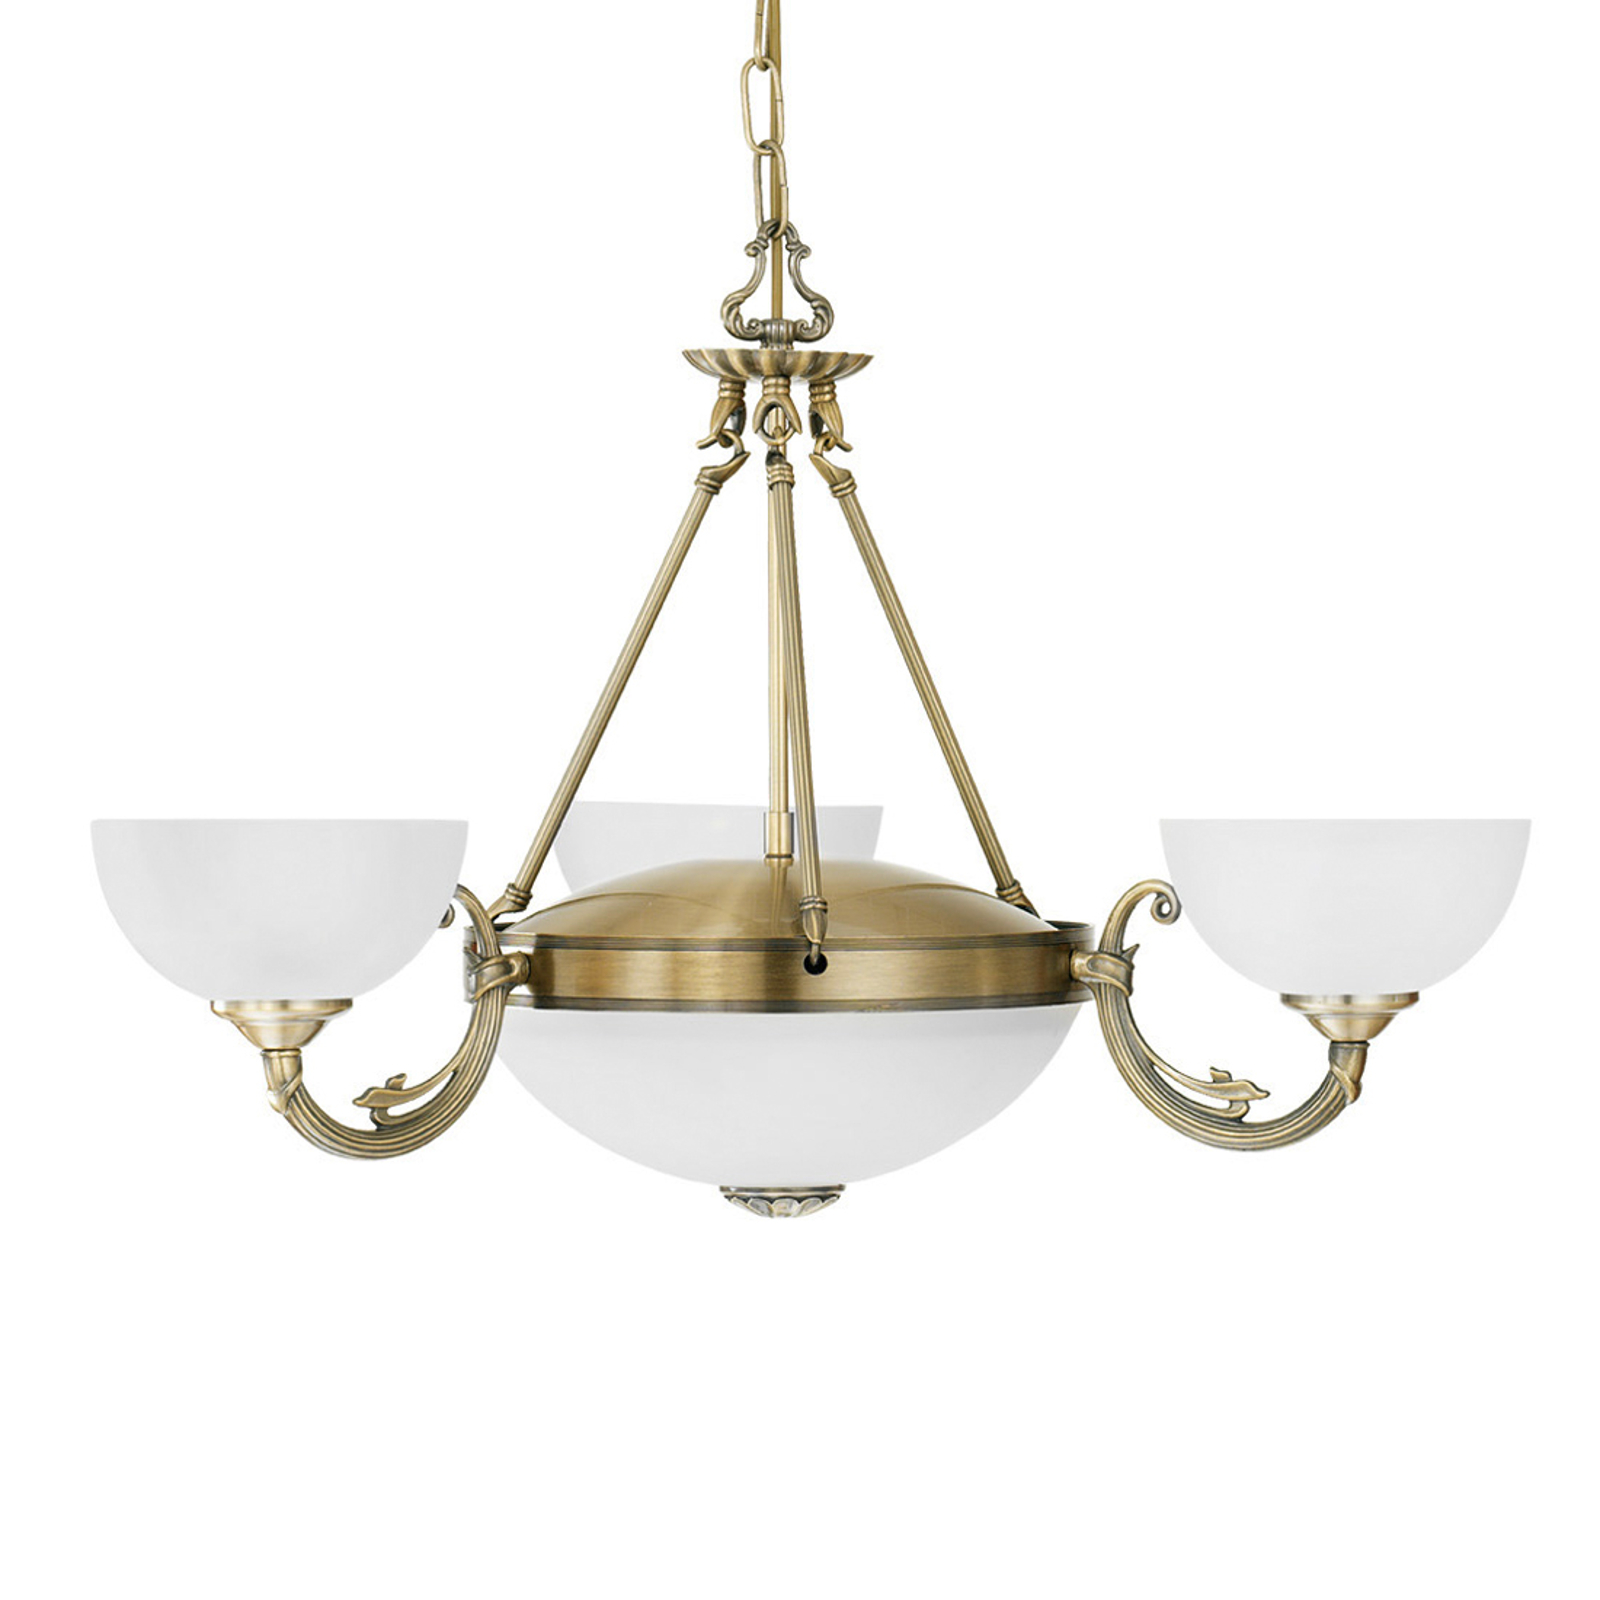 Hanglamp Savy, 5-lamps